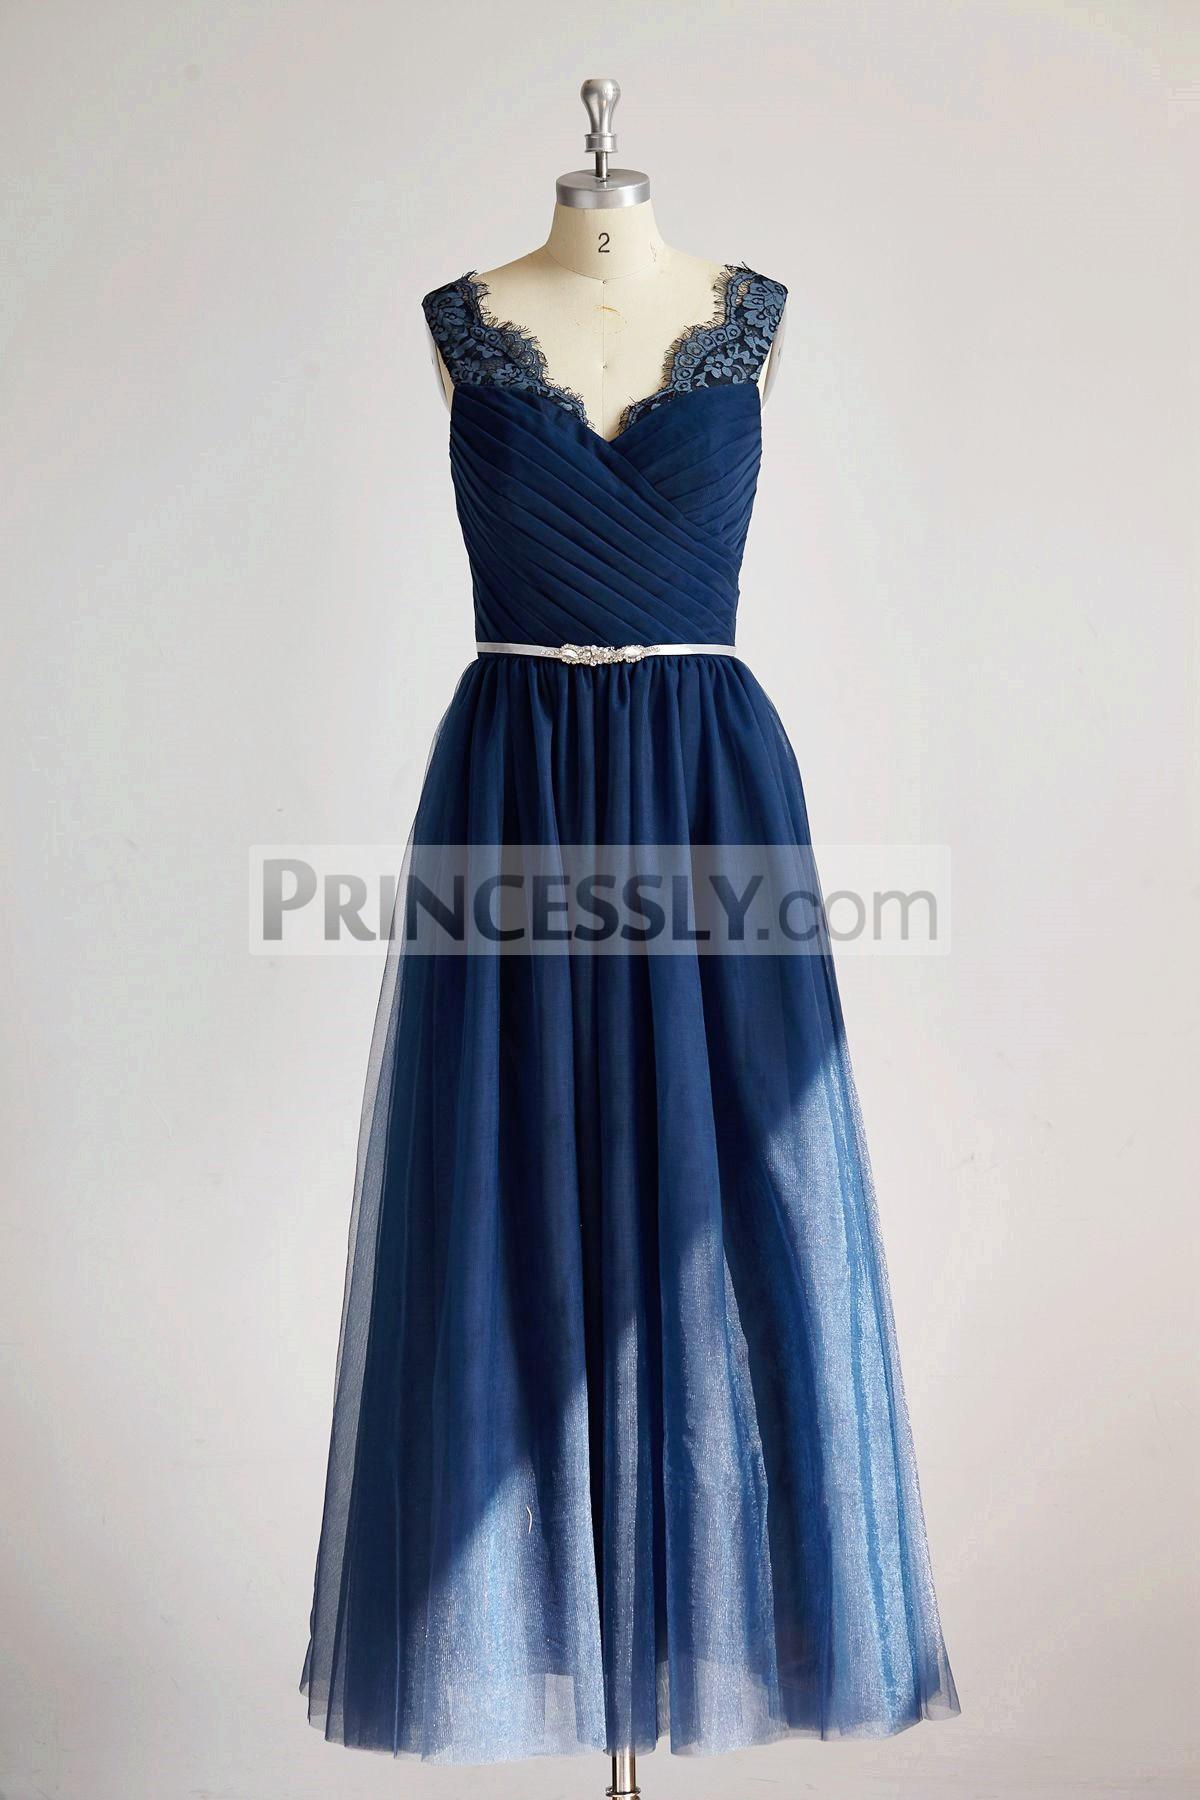 Princessly.com-K1000291-V Neck Navy Blue Lace Tulle Long Bridesmaid Dress/Wedding Party Dress-31